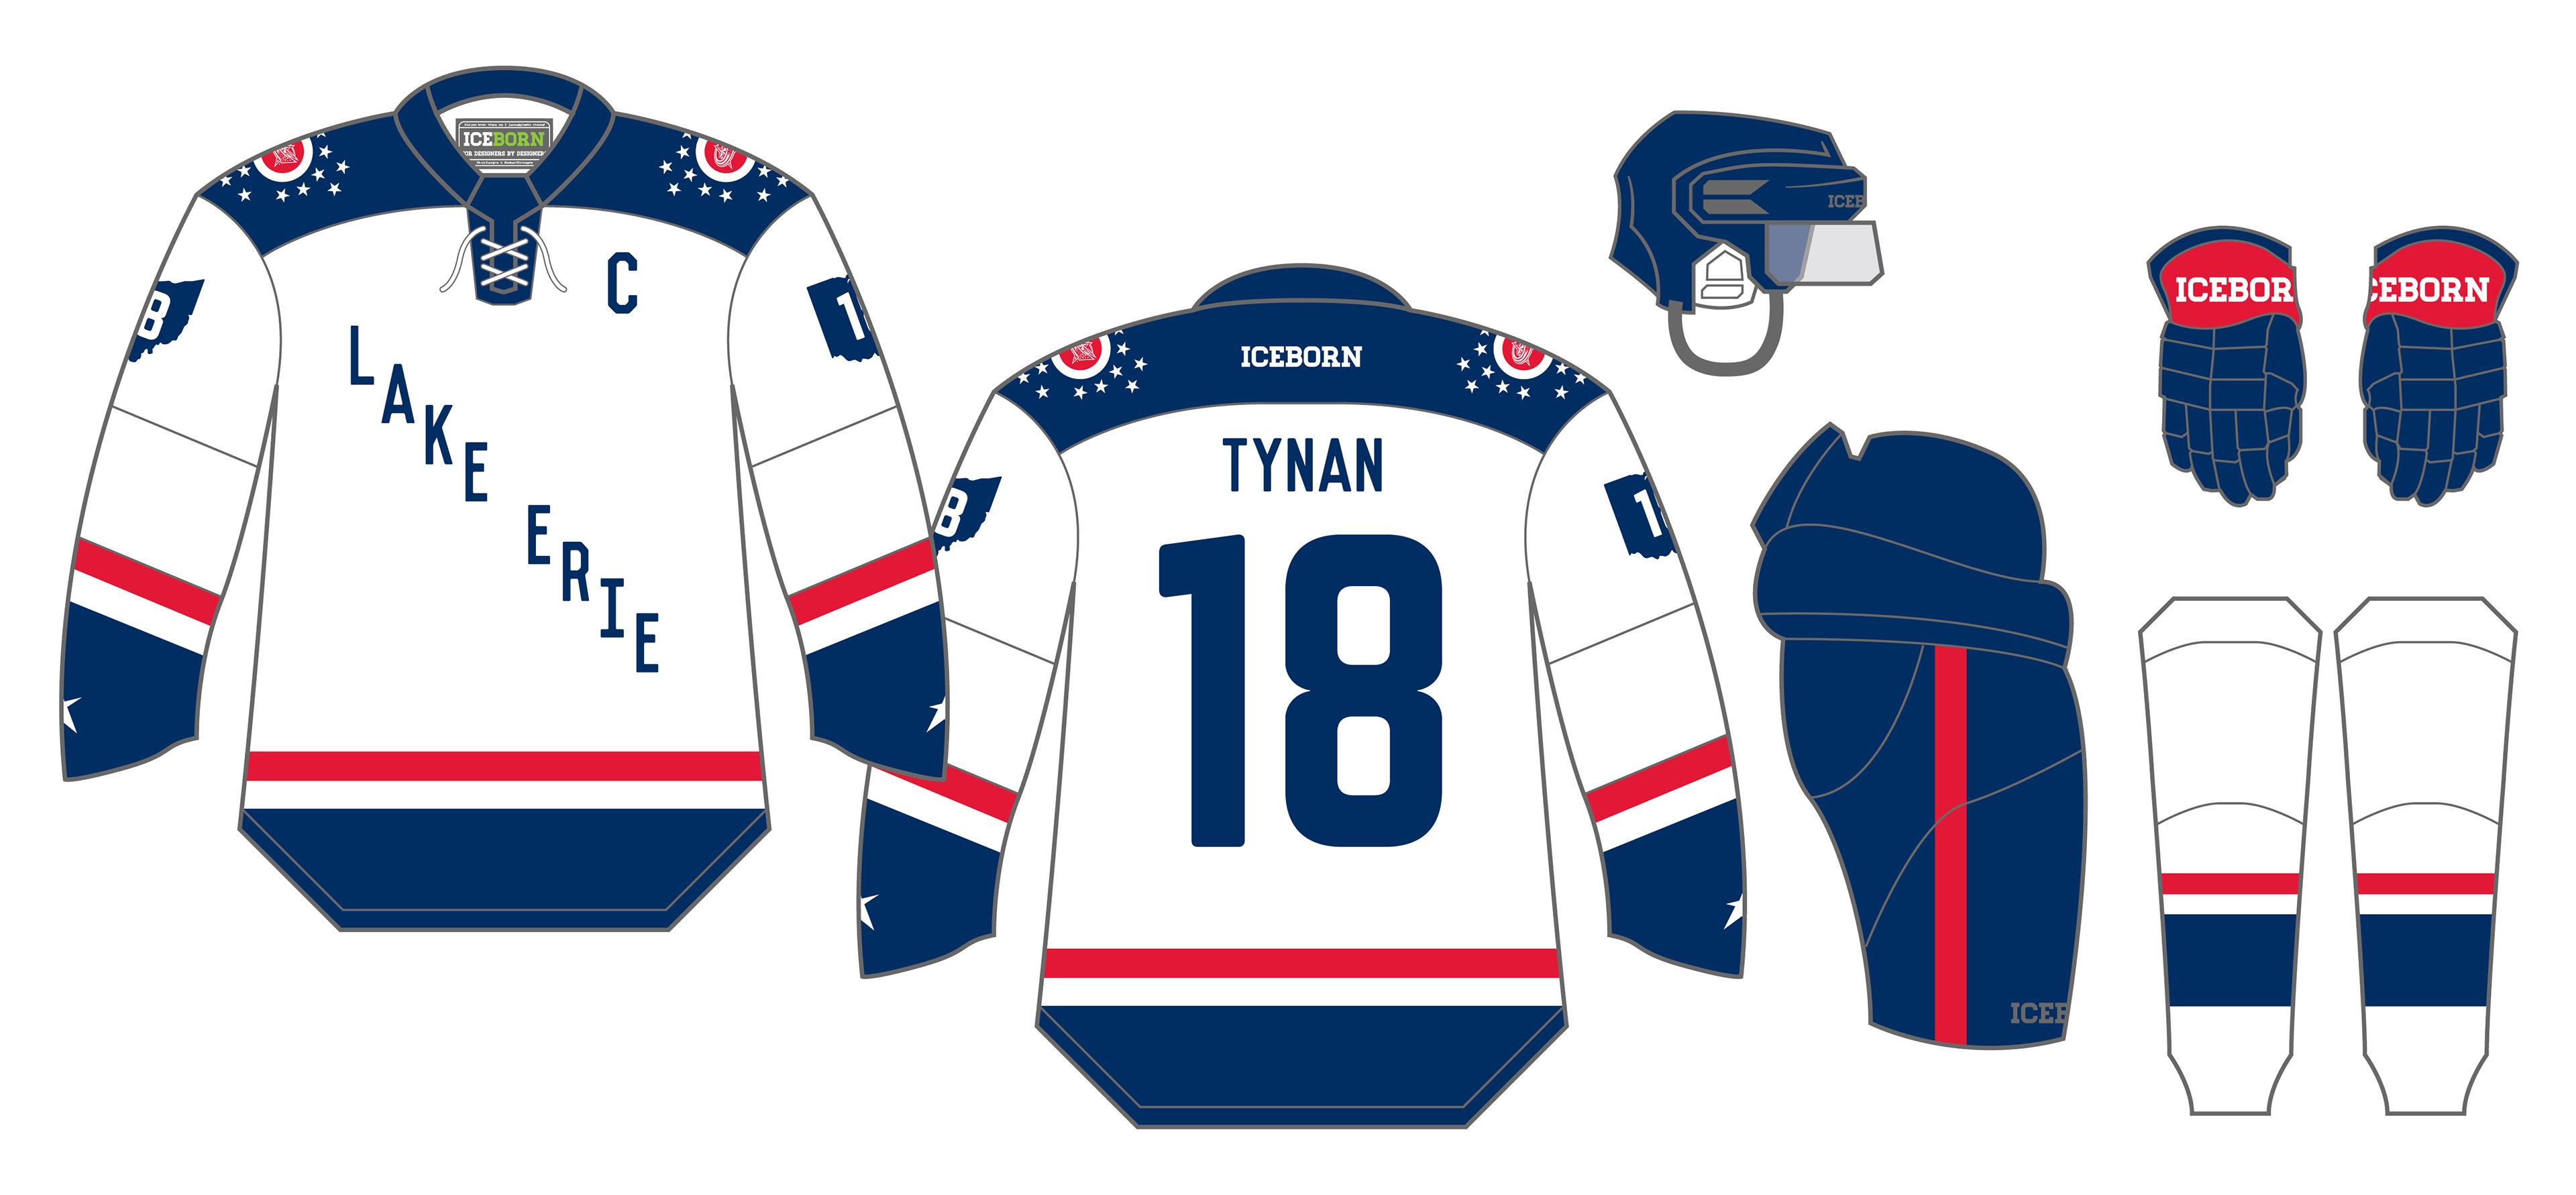 Shirt design concepts - Chiller Adult Hockey League Cahl Jersey Designs